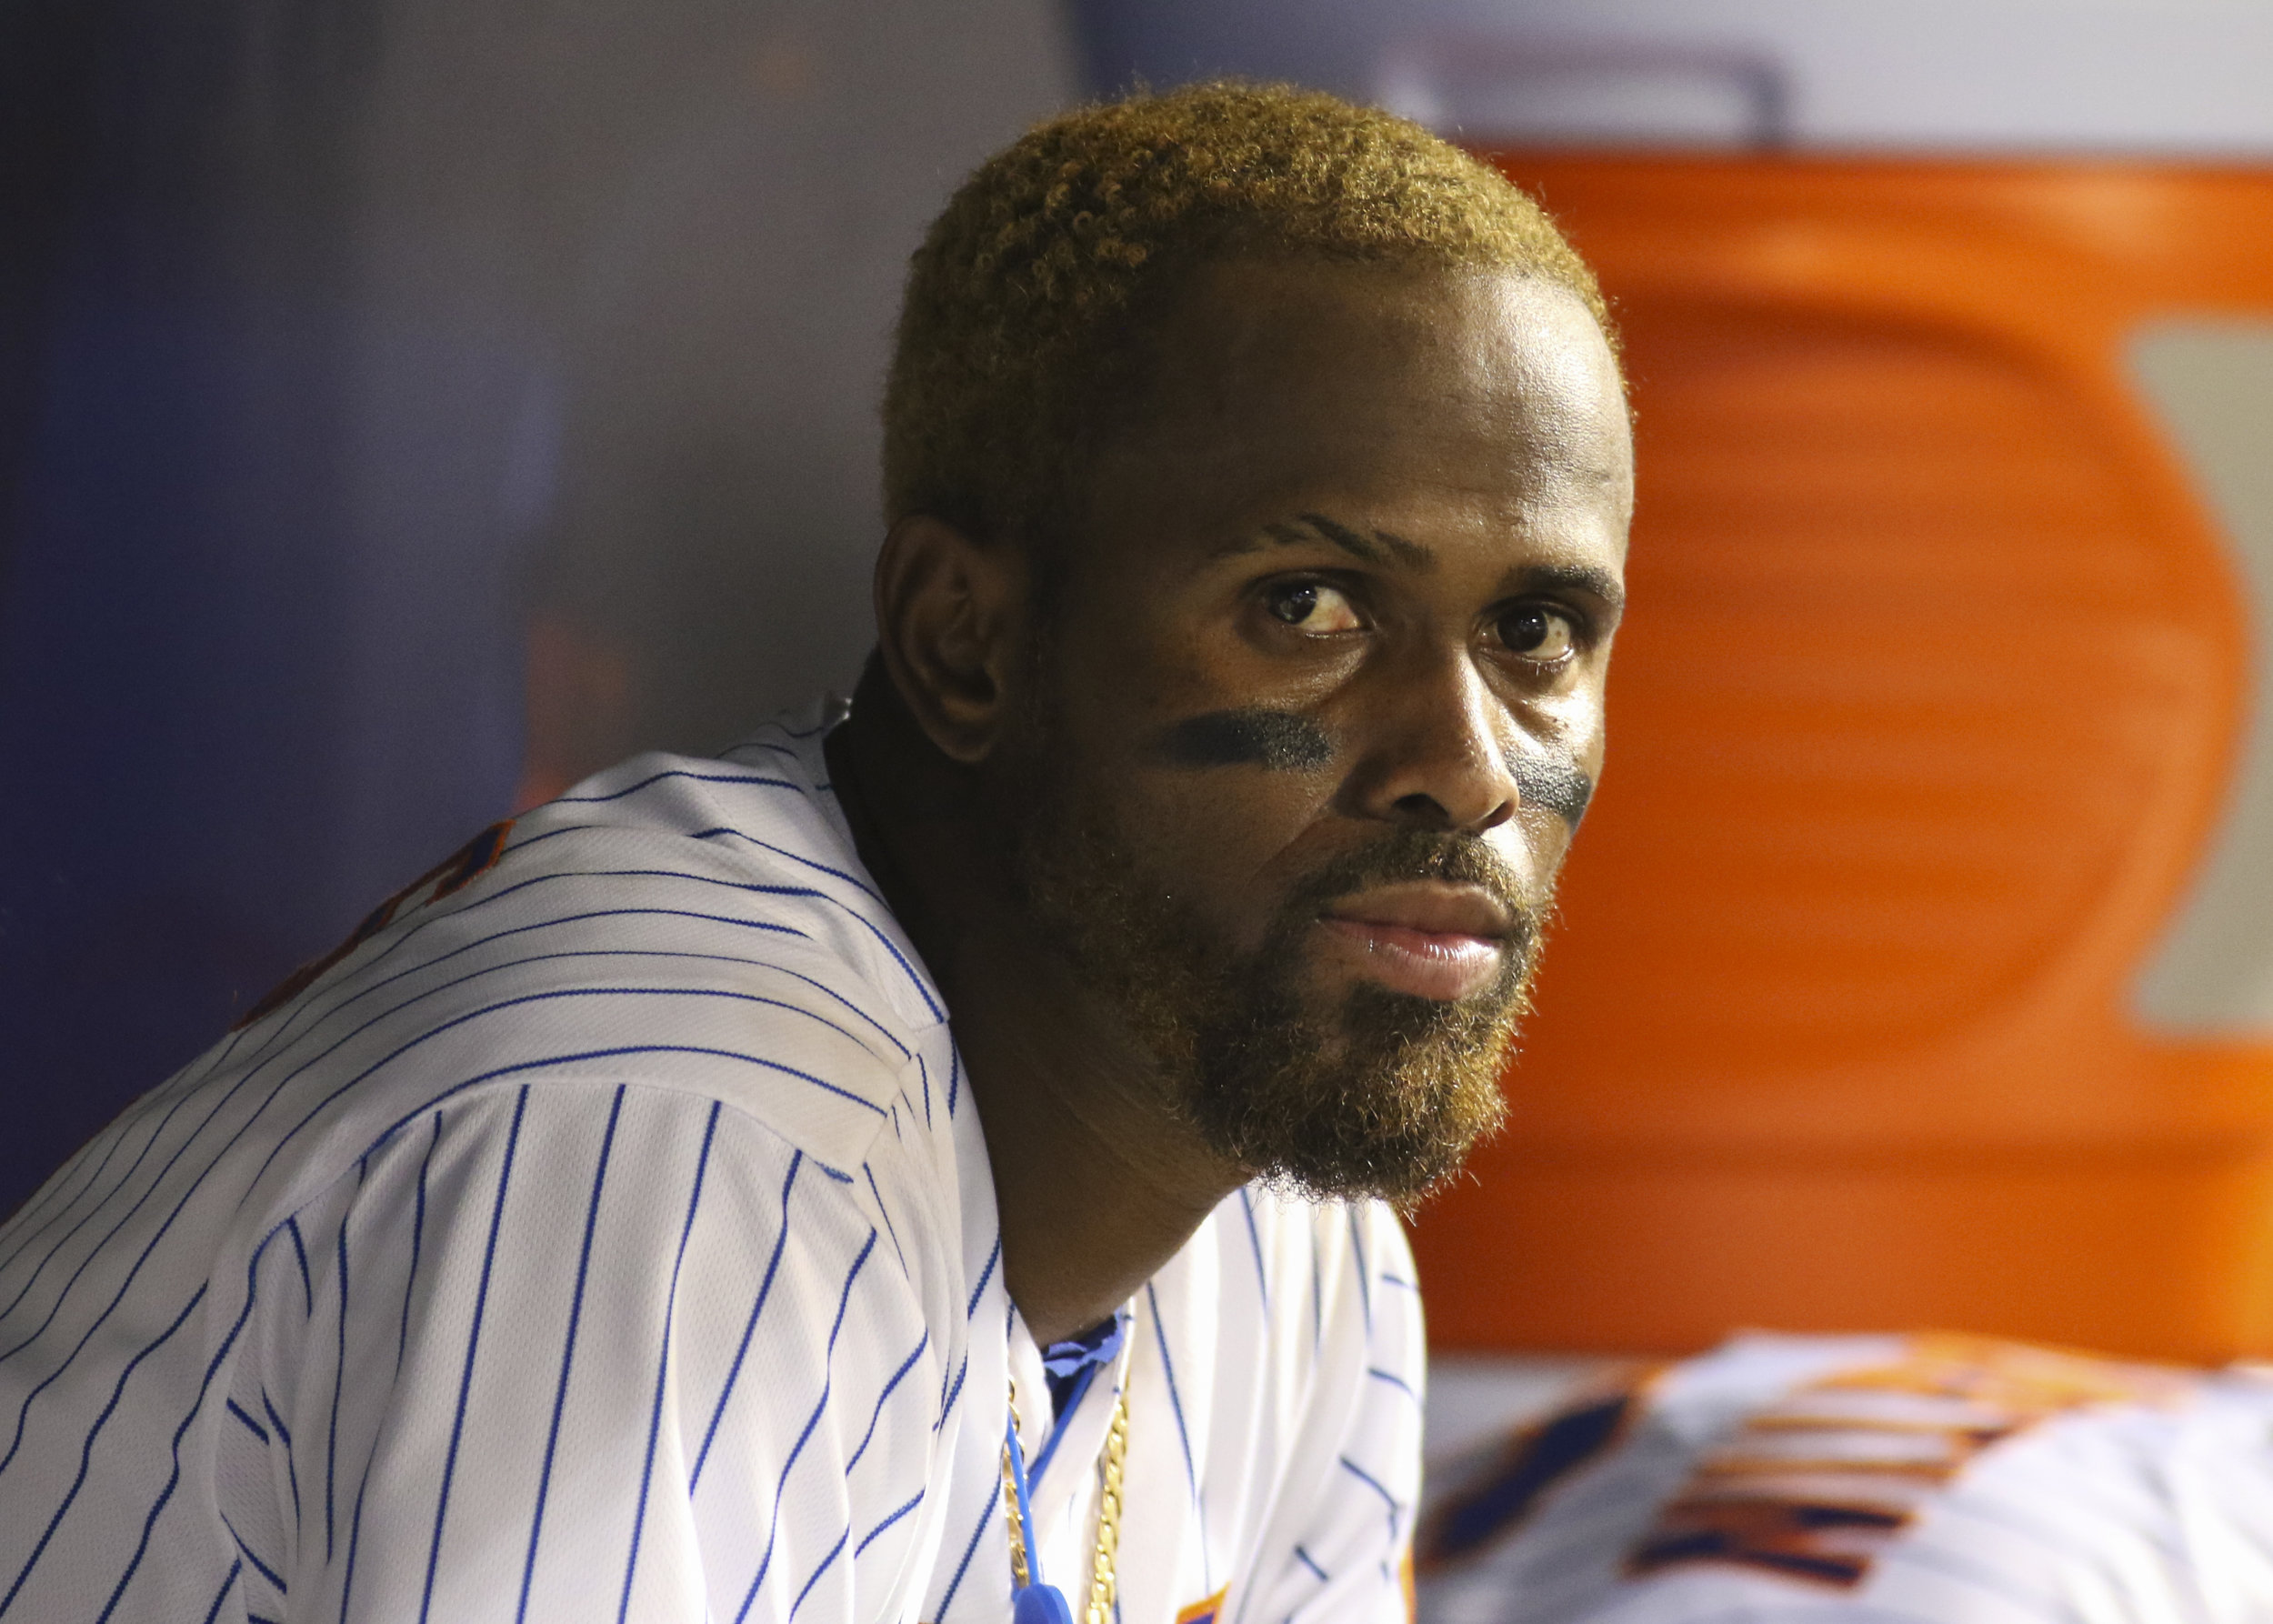 New York Mets infielder Jose Reyes.